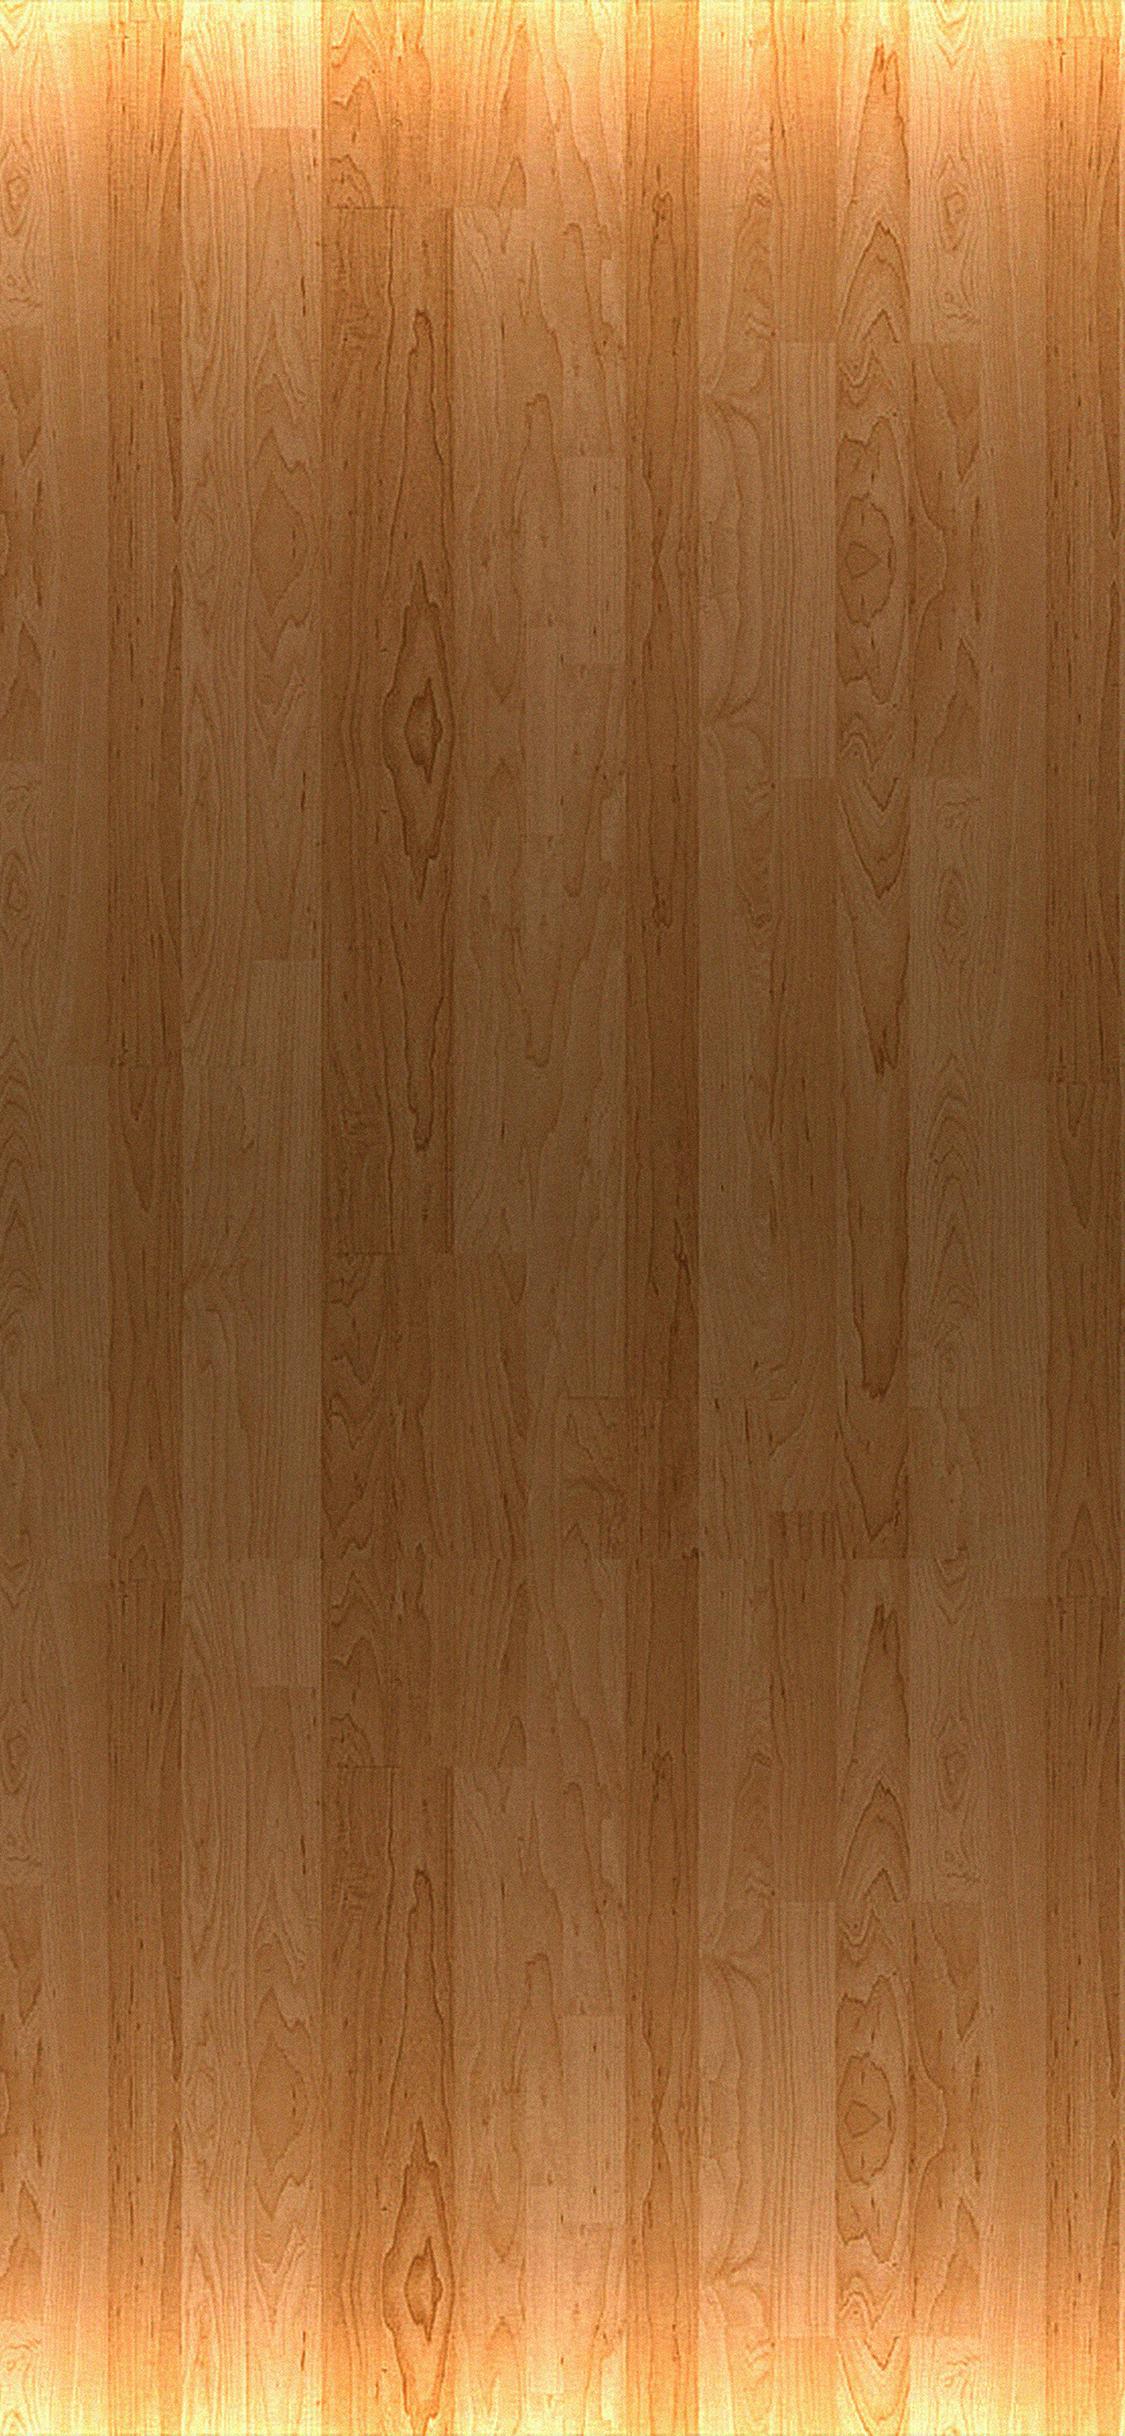 iPhoneXpapers.com-Apple-iPhone-wallpaper-vb66-wallpaper-tree-texture-light-pattern